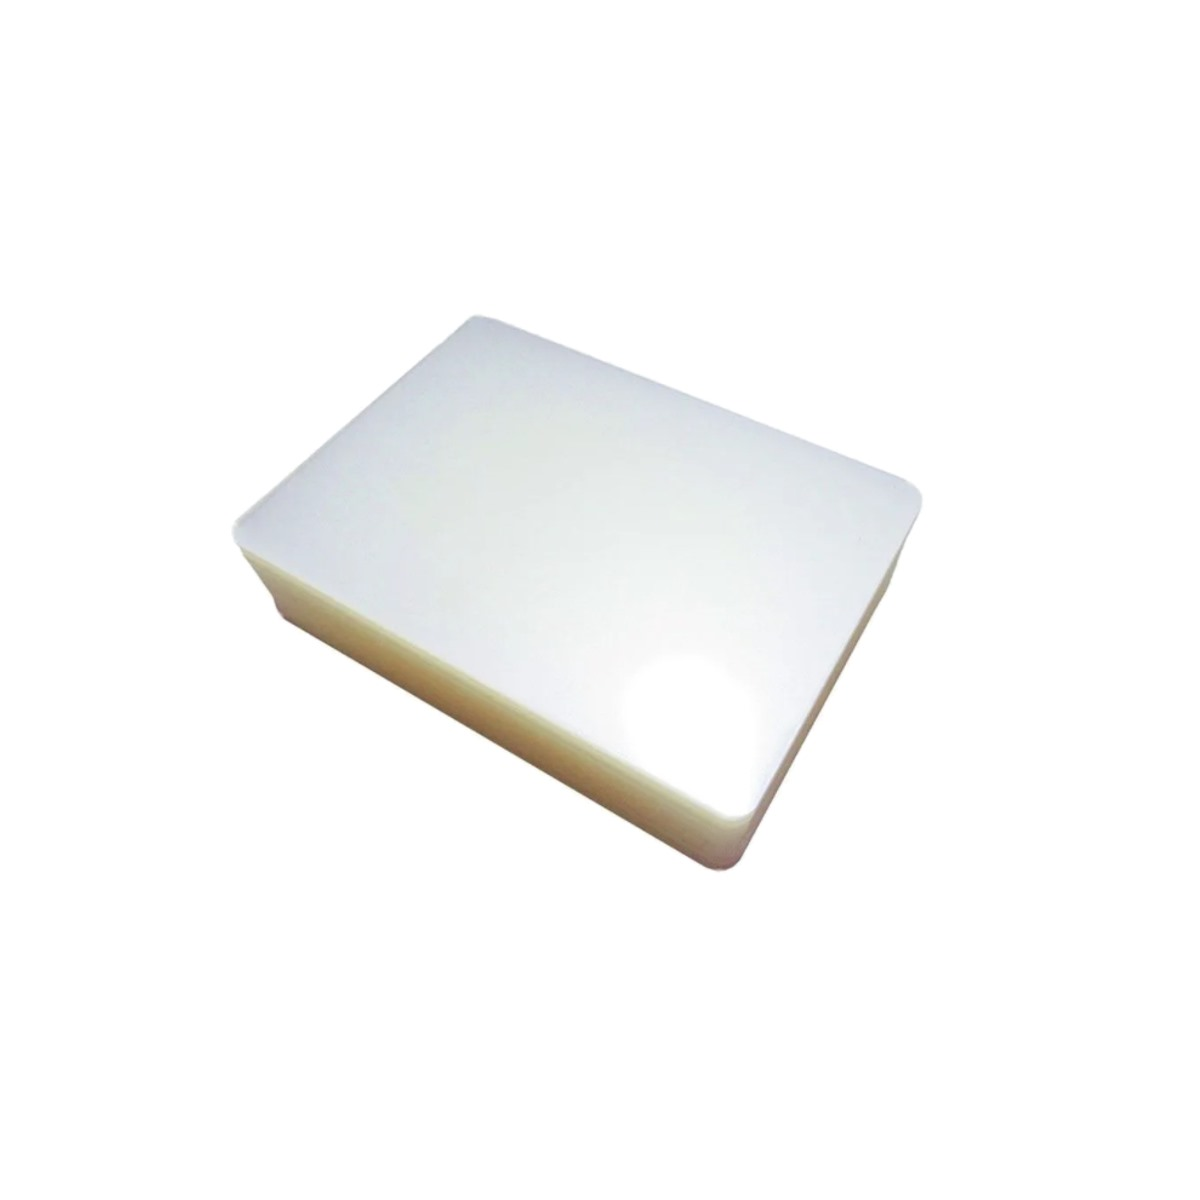 Polaseal plástico para plastificação Crachá 59x86 0,07mm 100un